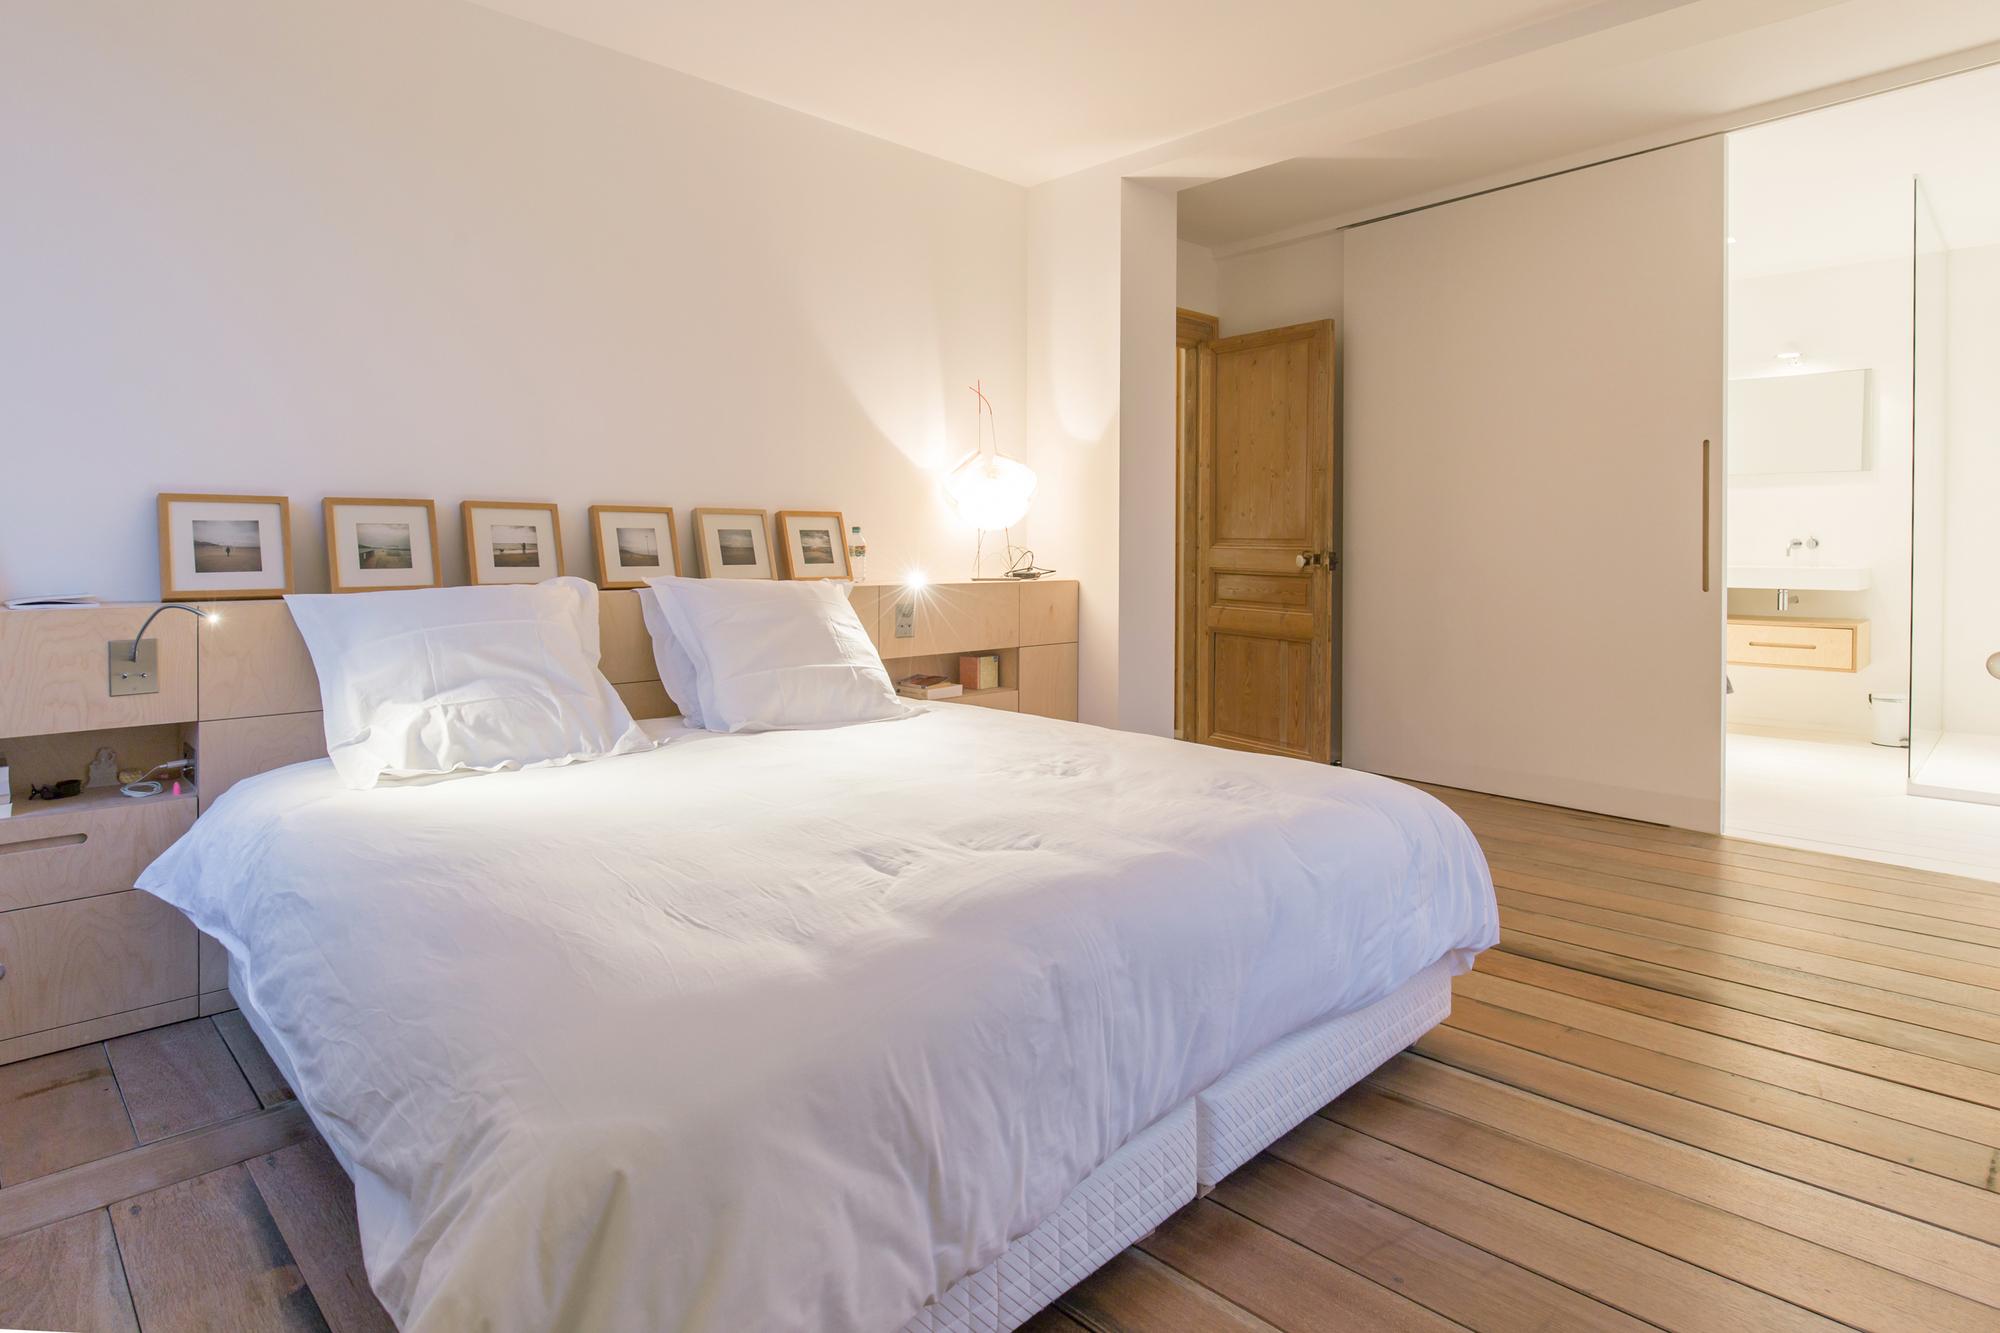 galer a de casa msr brengues le pavec architectes 12. Black Bedroom Furniture Sets. Home Design Ideas